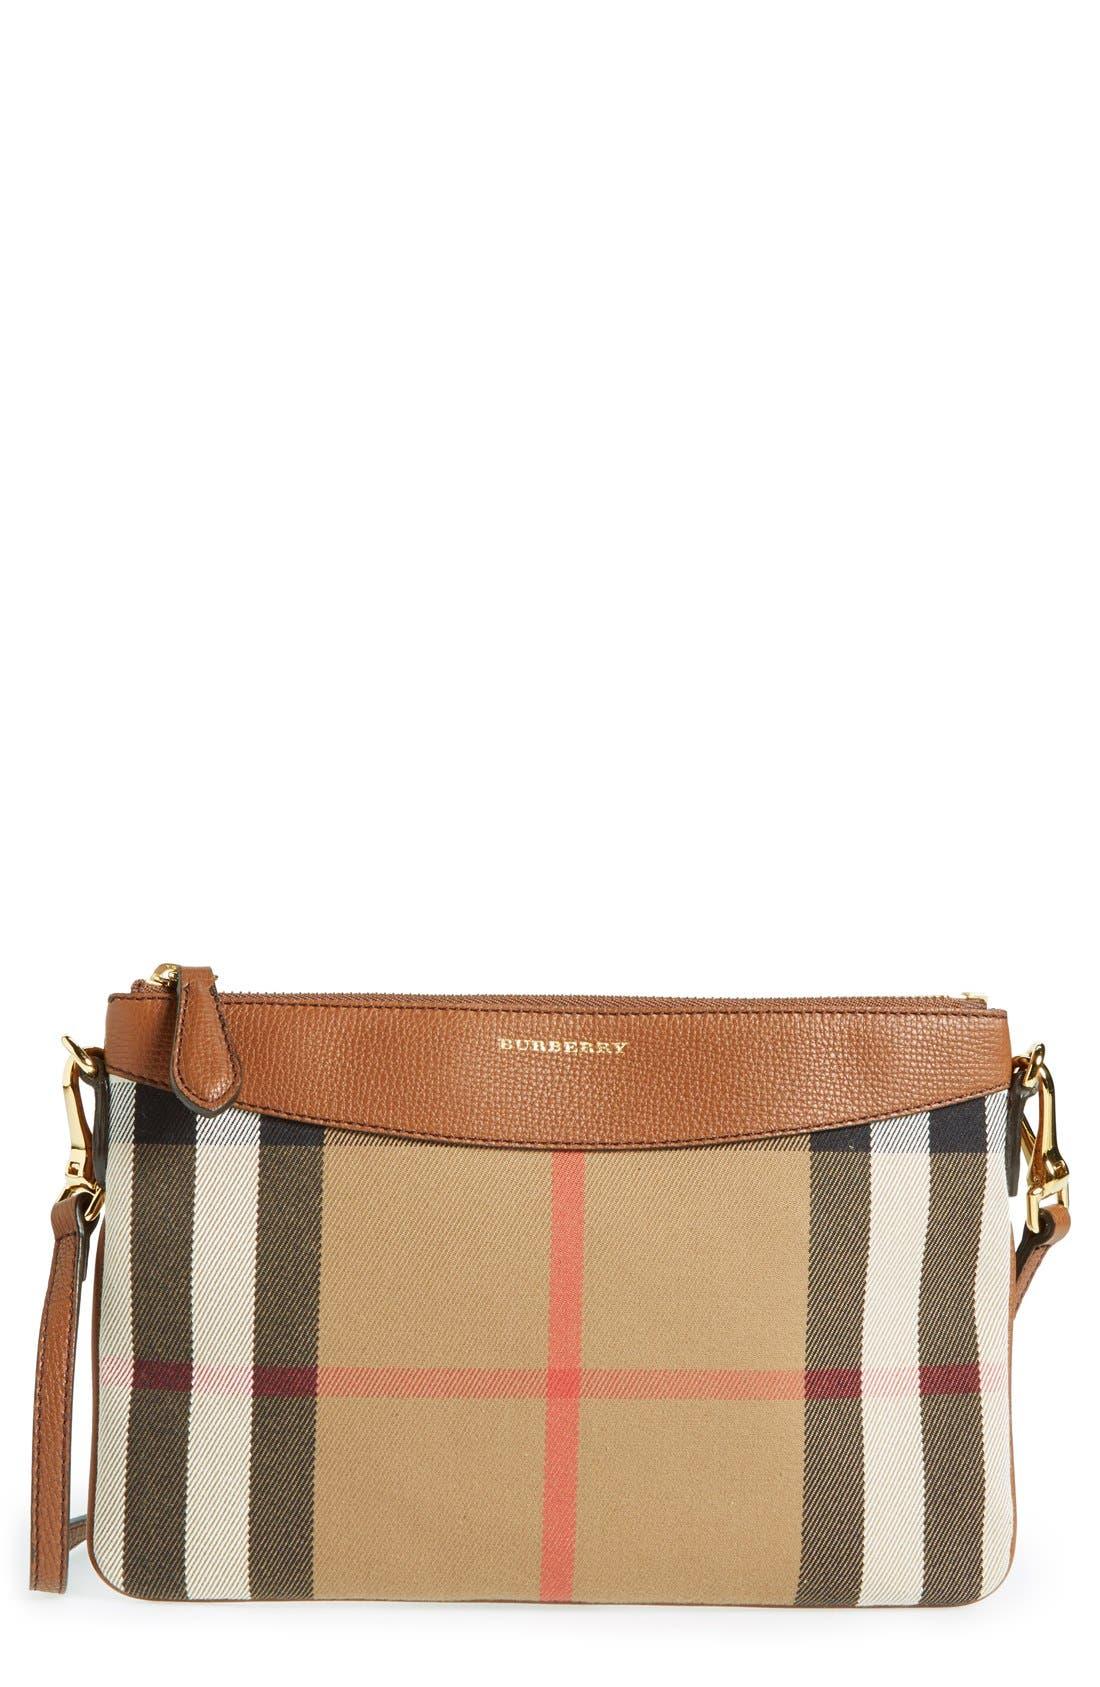 'Peyton - House Check' Crossbody Bag, Main, color, 250